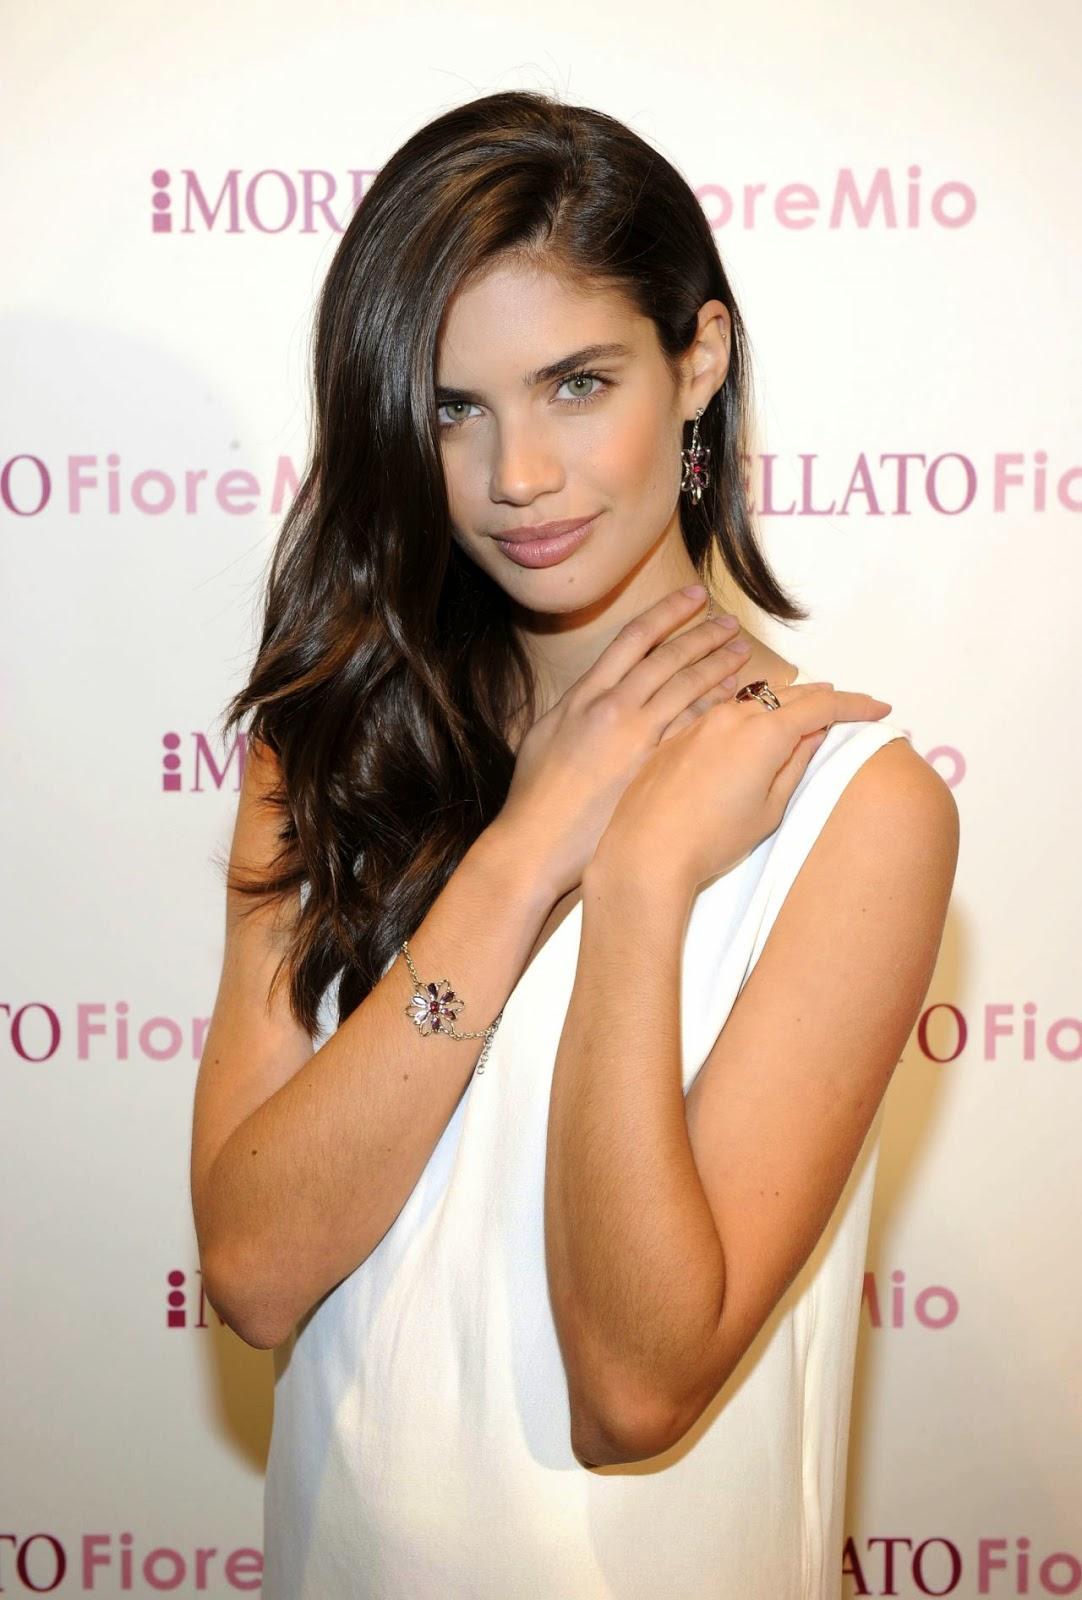 Hot Photos of Sara Sampaio.